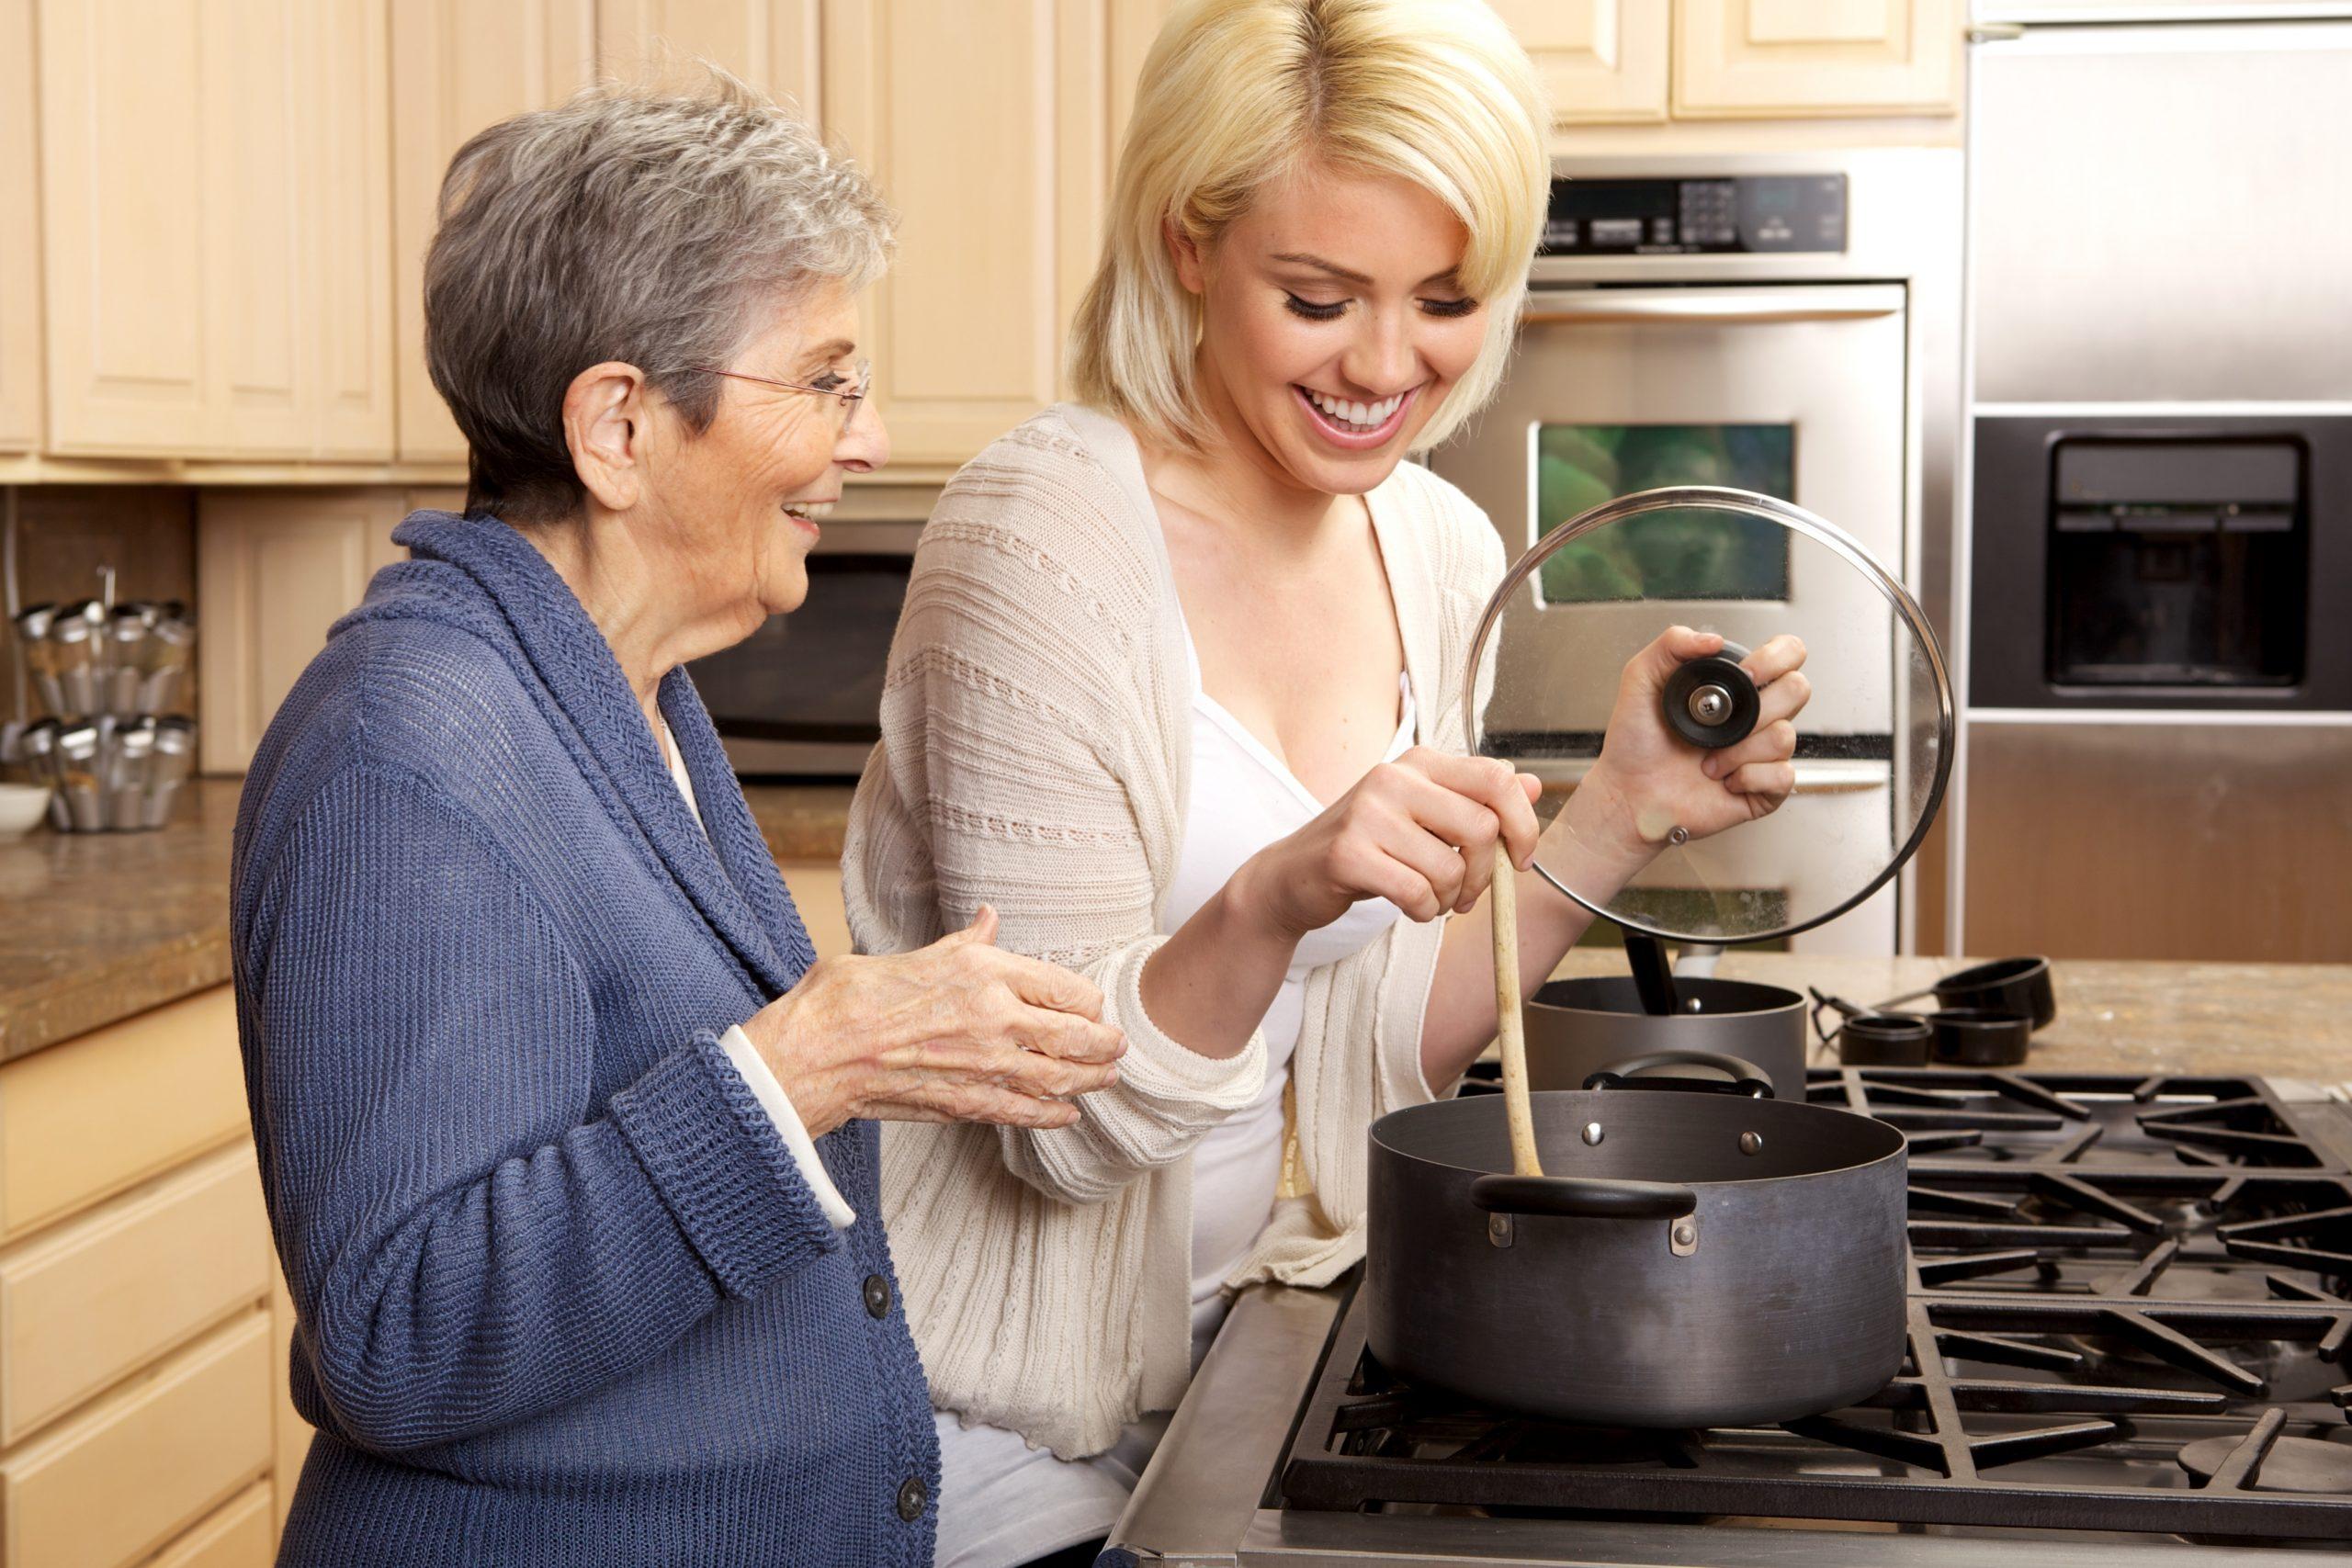 tewkesbury meal preparation by take five homecare